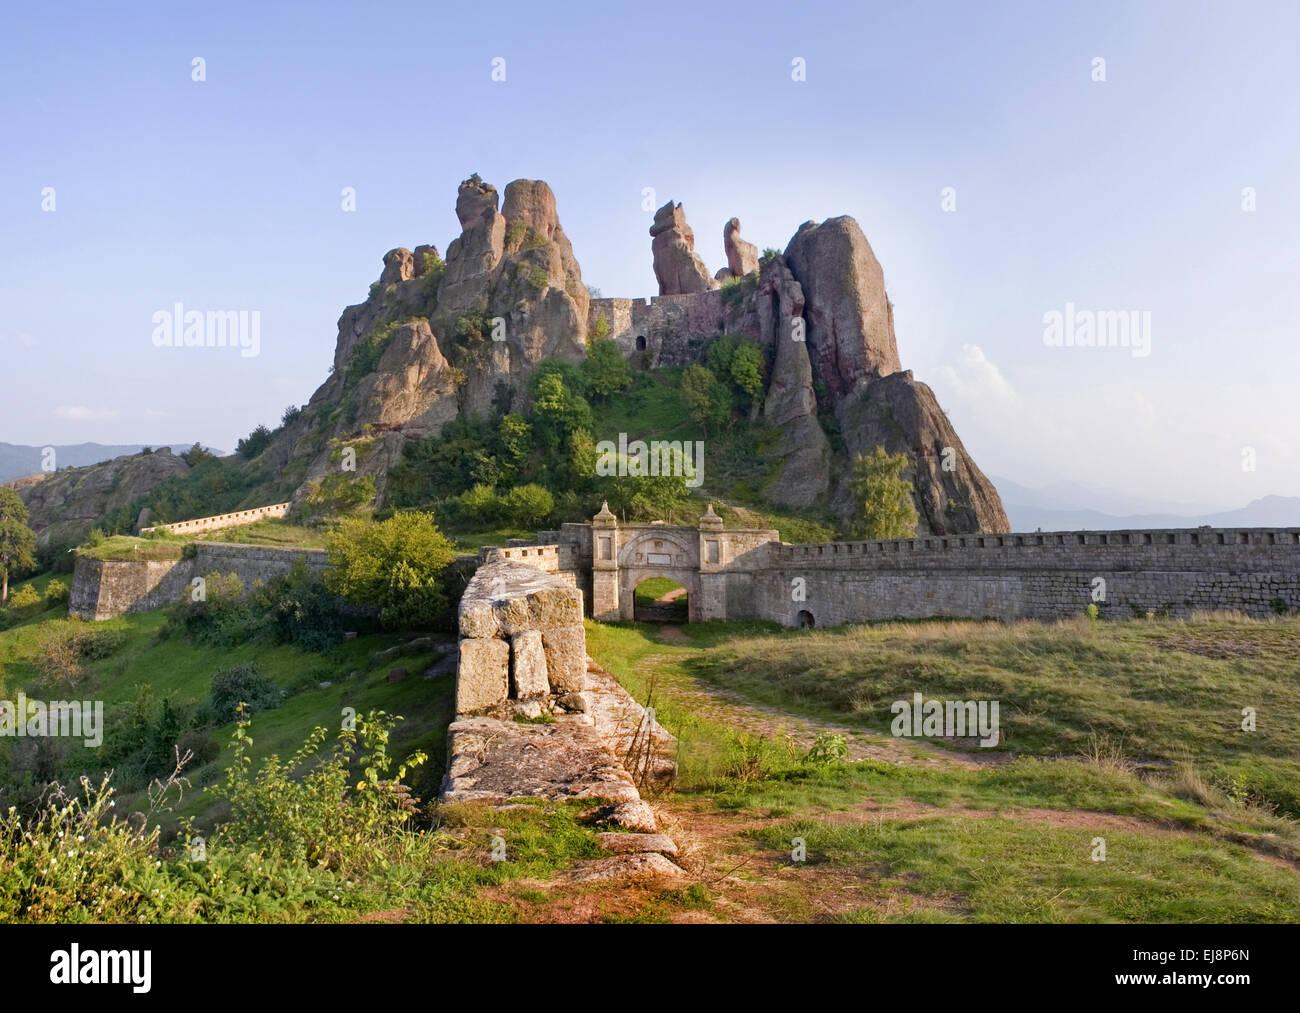 Felsphänomen in Belogradchik, Bulgarien Stockbild